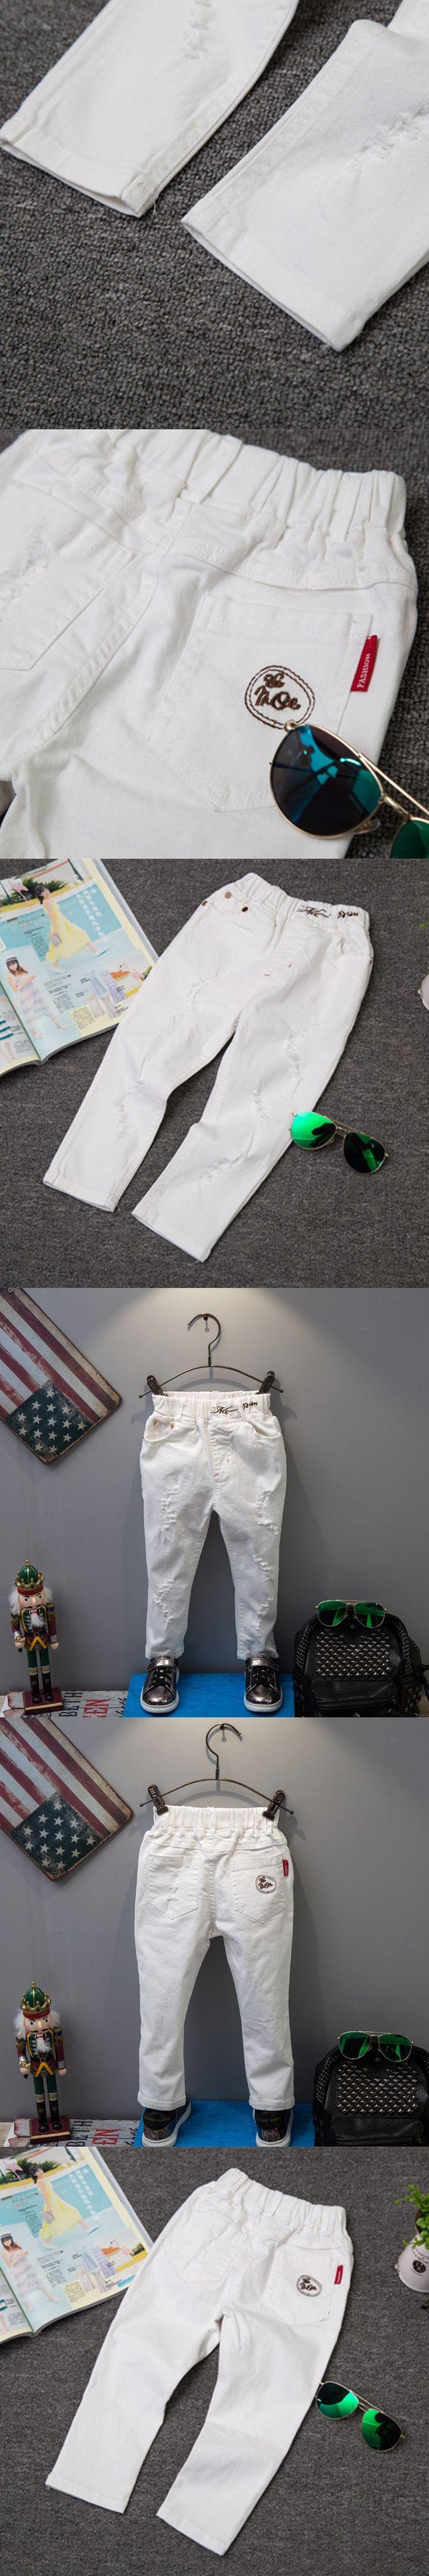 Spring New Brand Korean Style Baby Boys Jeans Pants Fashion Kids Ripped Jeans Boys Soild White Denim Pants Baby Jeans Trousers